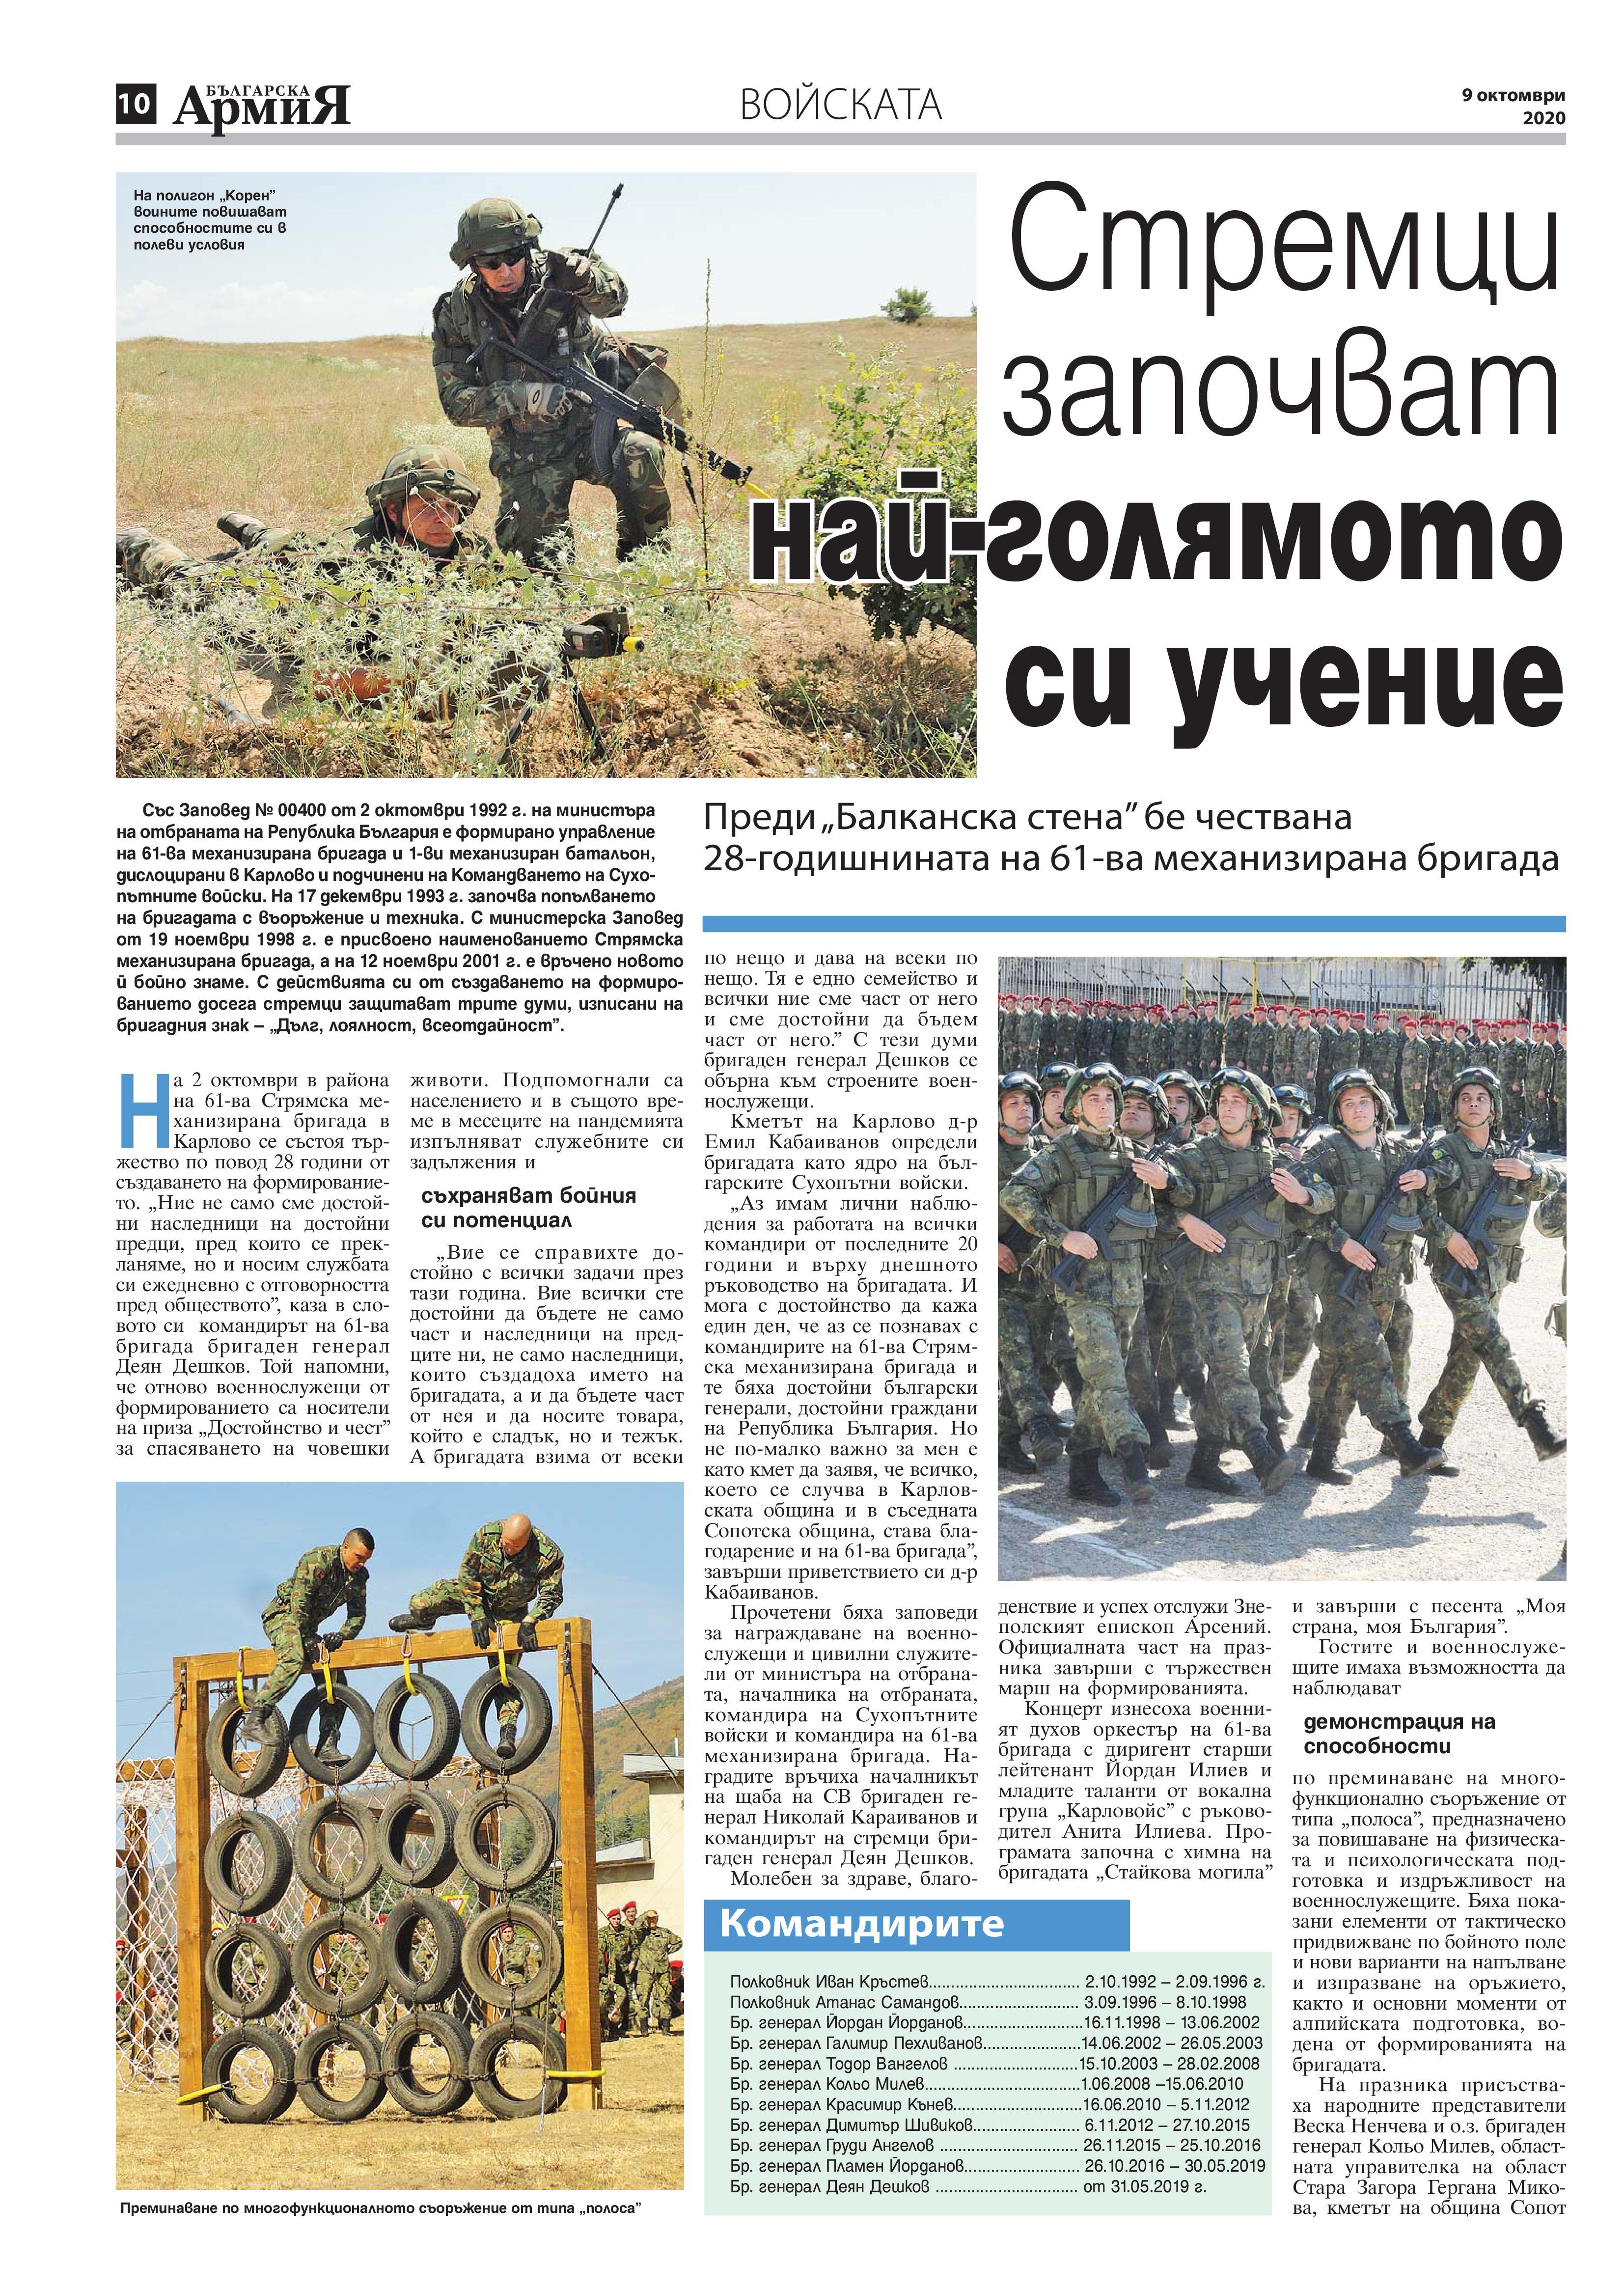 https://armymedia.bg/wp-content/uploads/2015/06/10-43.jpg